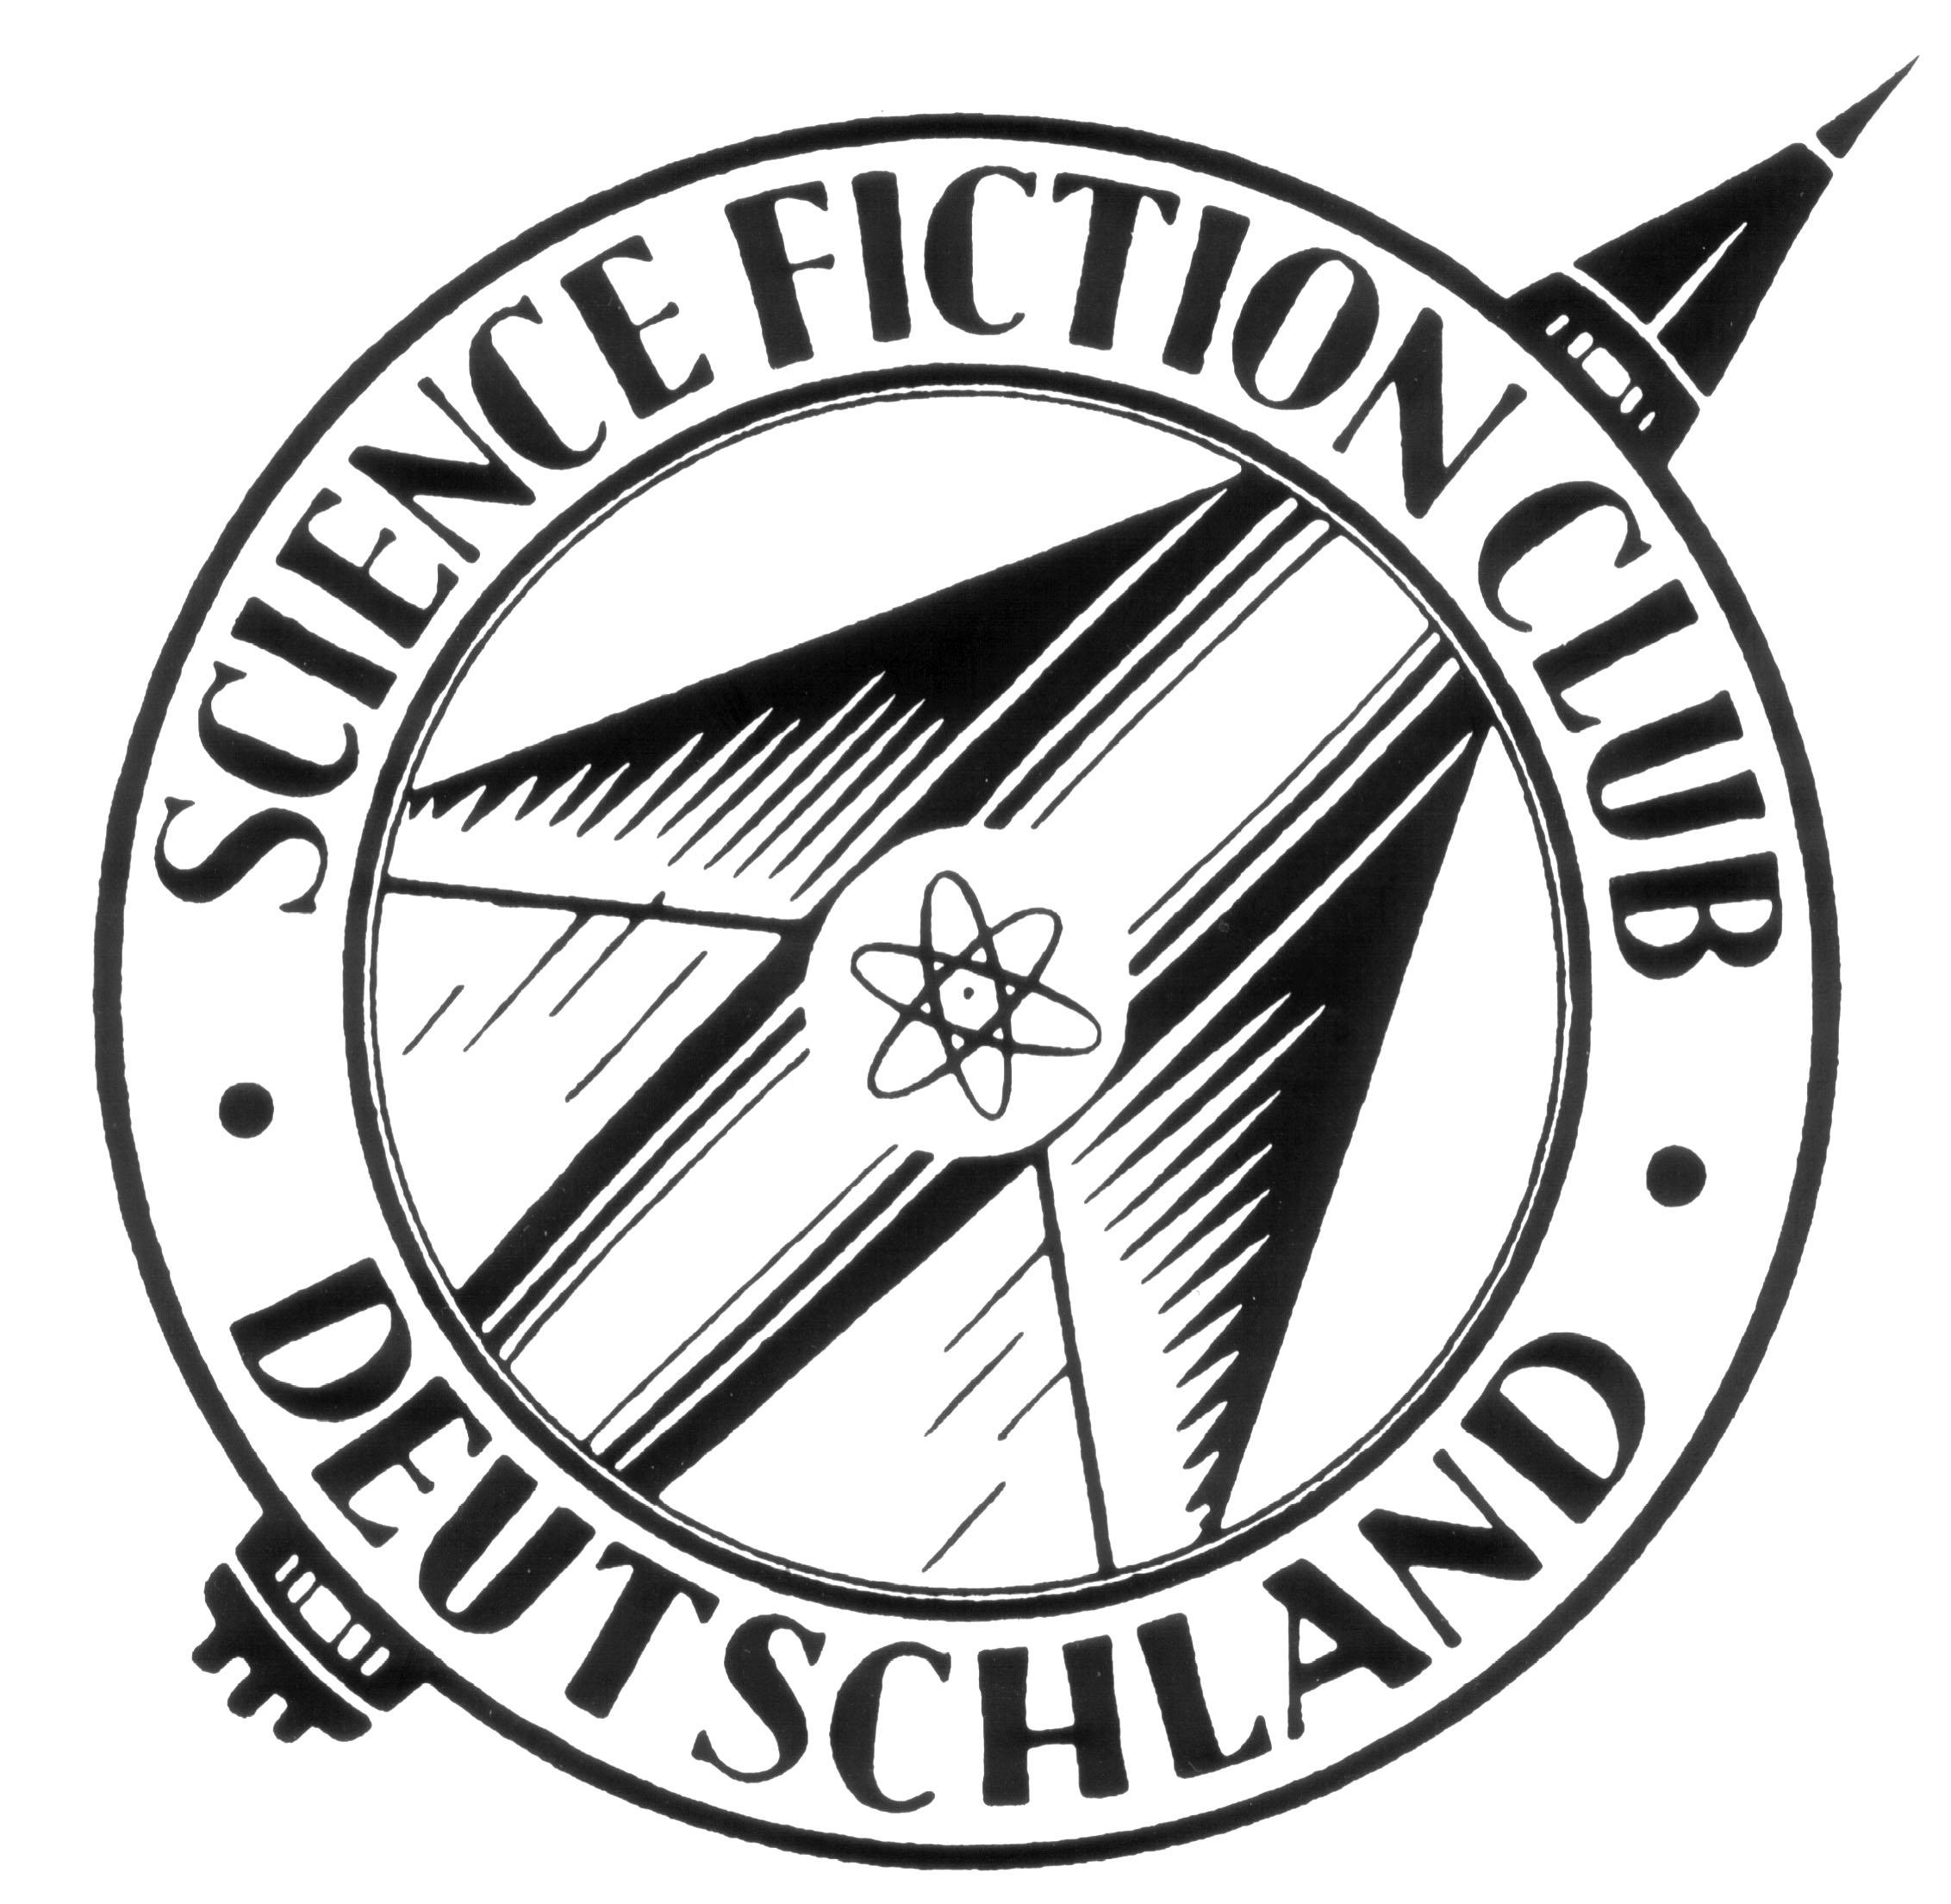 Logo des Science Fiction Club Deutschland e.V.